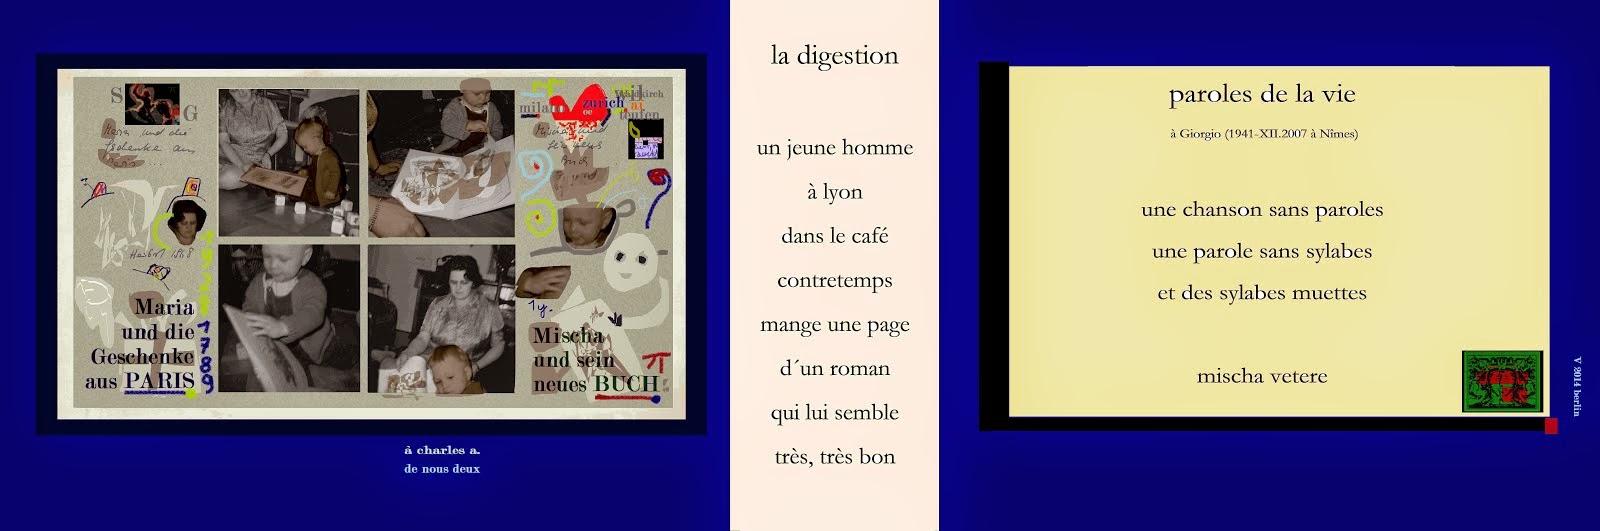 charles aznavour maria barbara pfister saint gall DIOR haute couture PARIS lyon vetere mischa berl